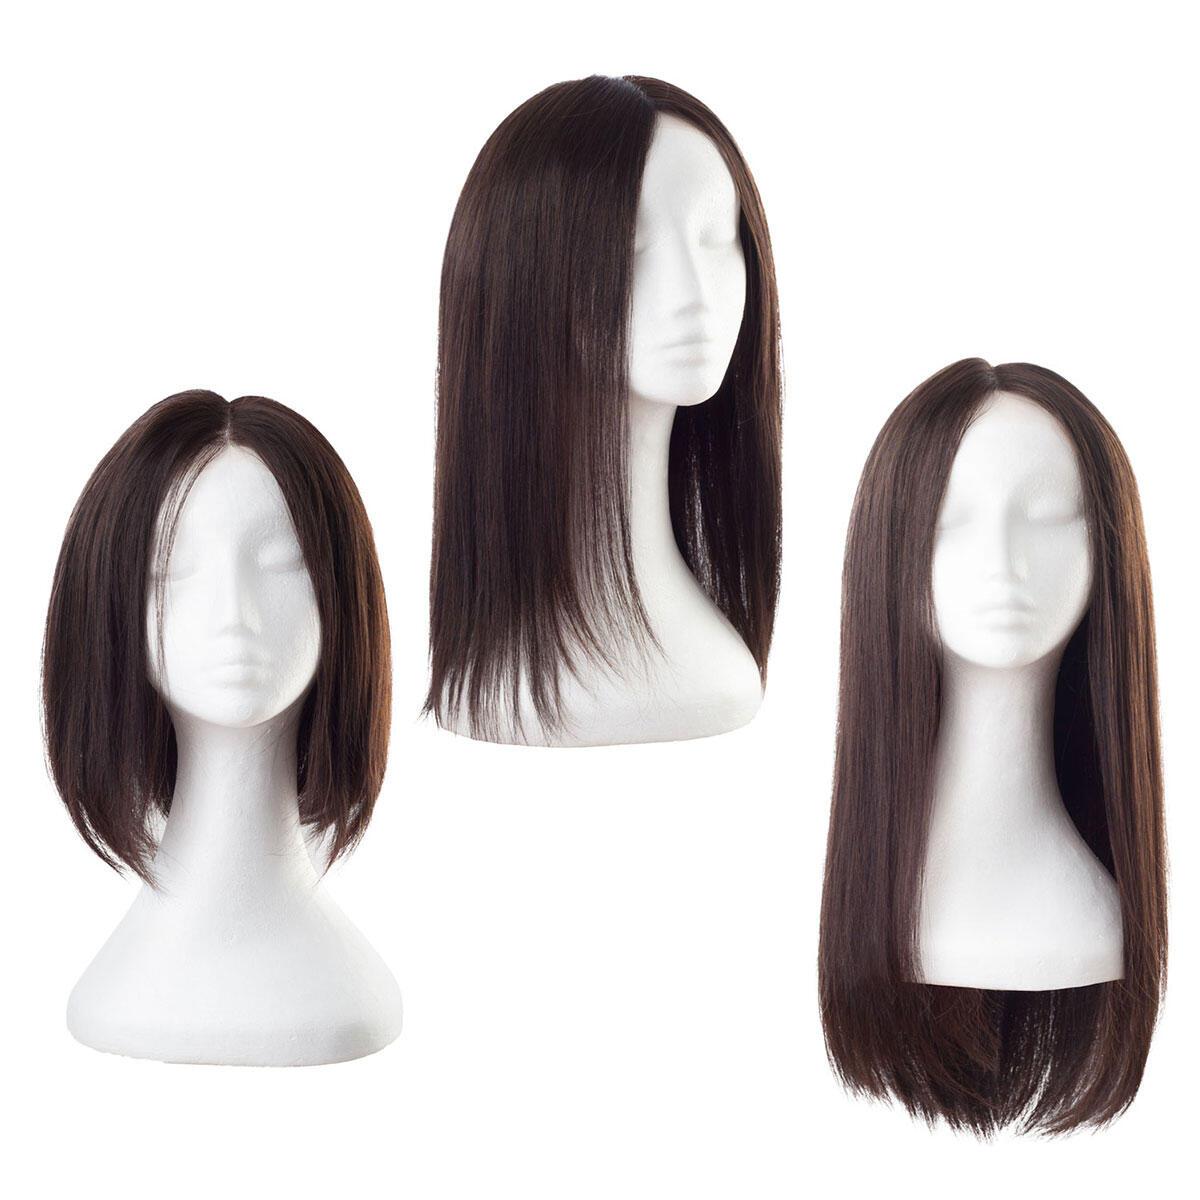 Lace Wig 2.0 Dark Brown 45 cm